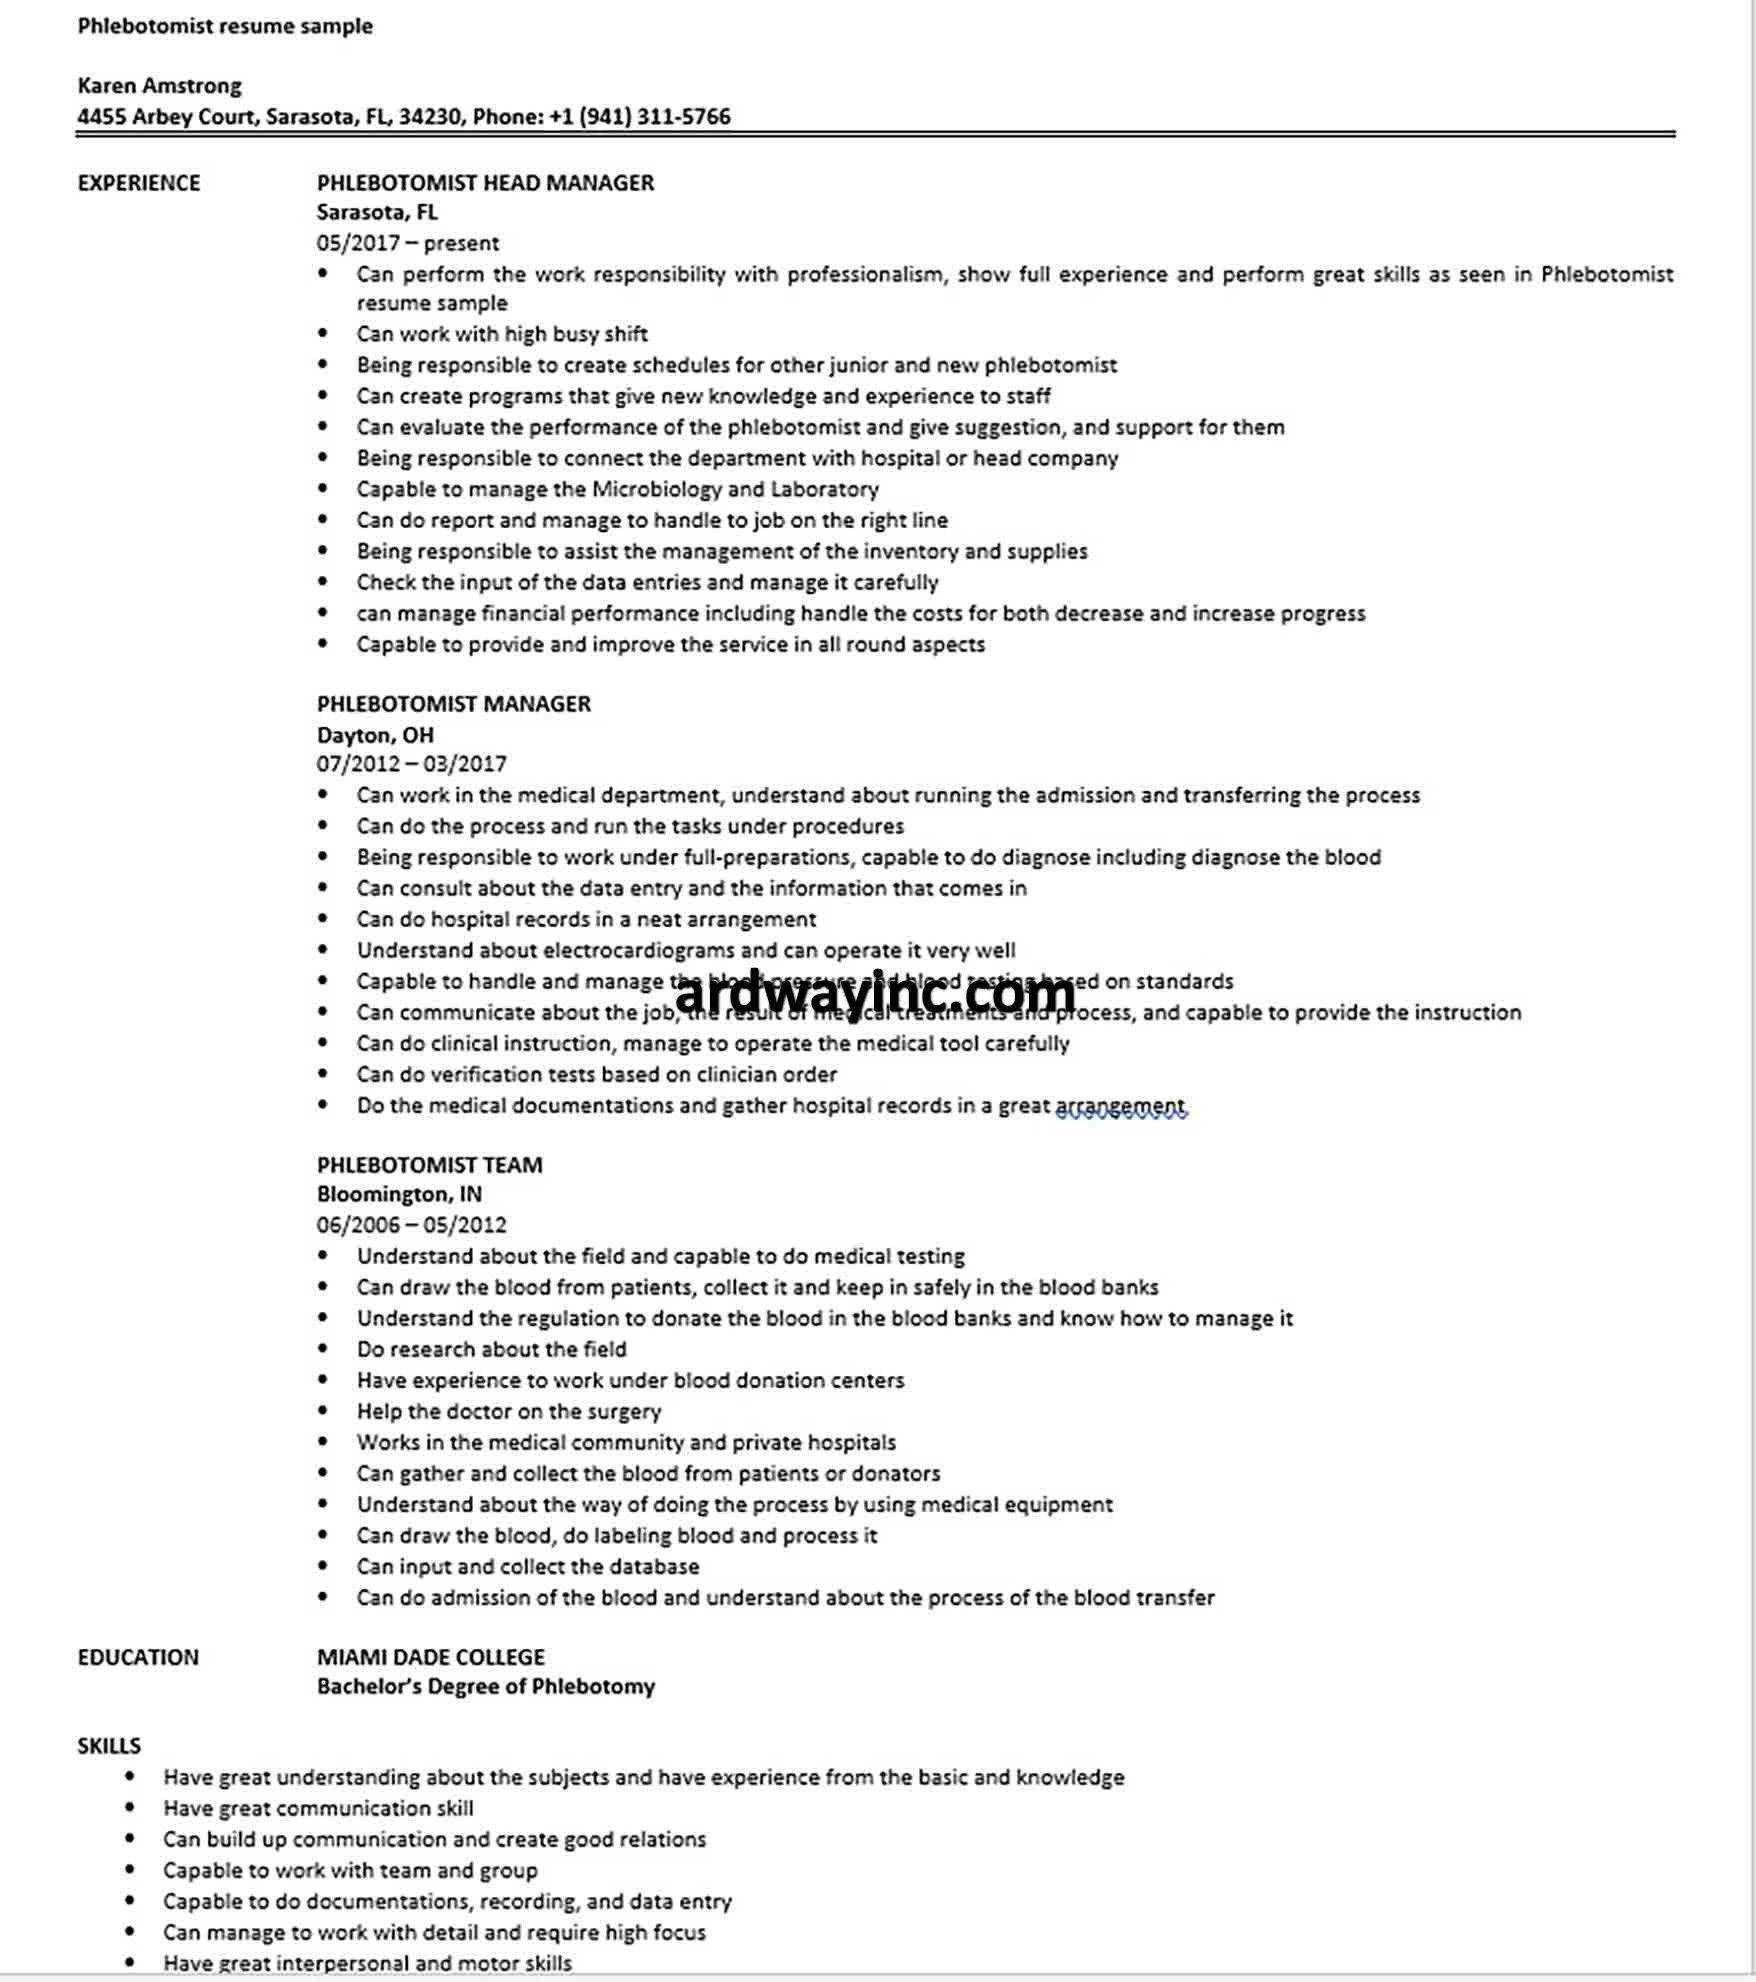 Phlebotomist resume sample in 2020 Phlebotomist, Medical